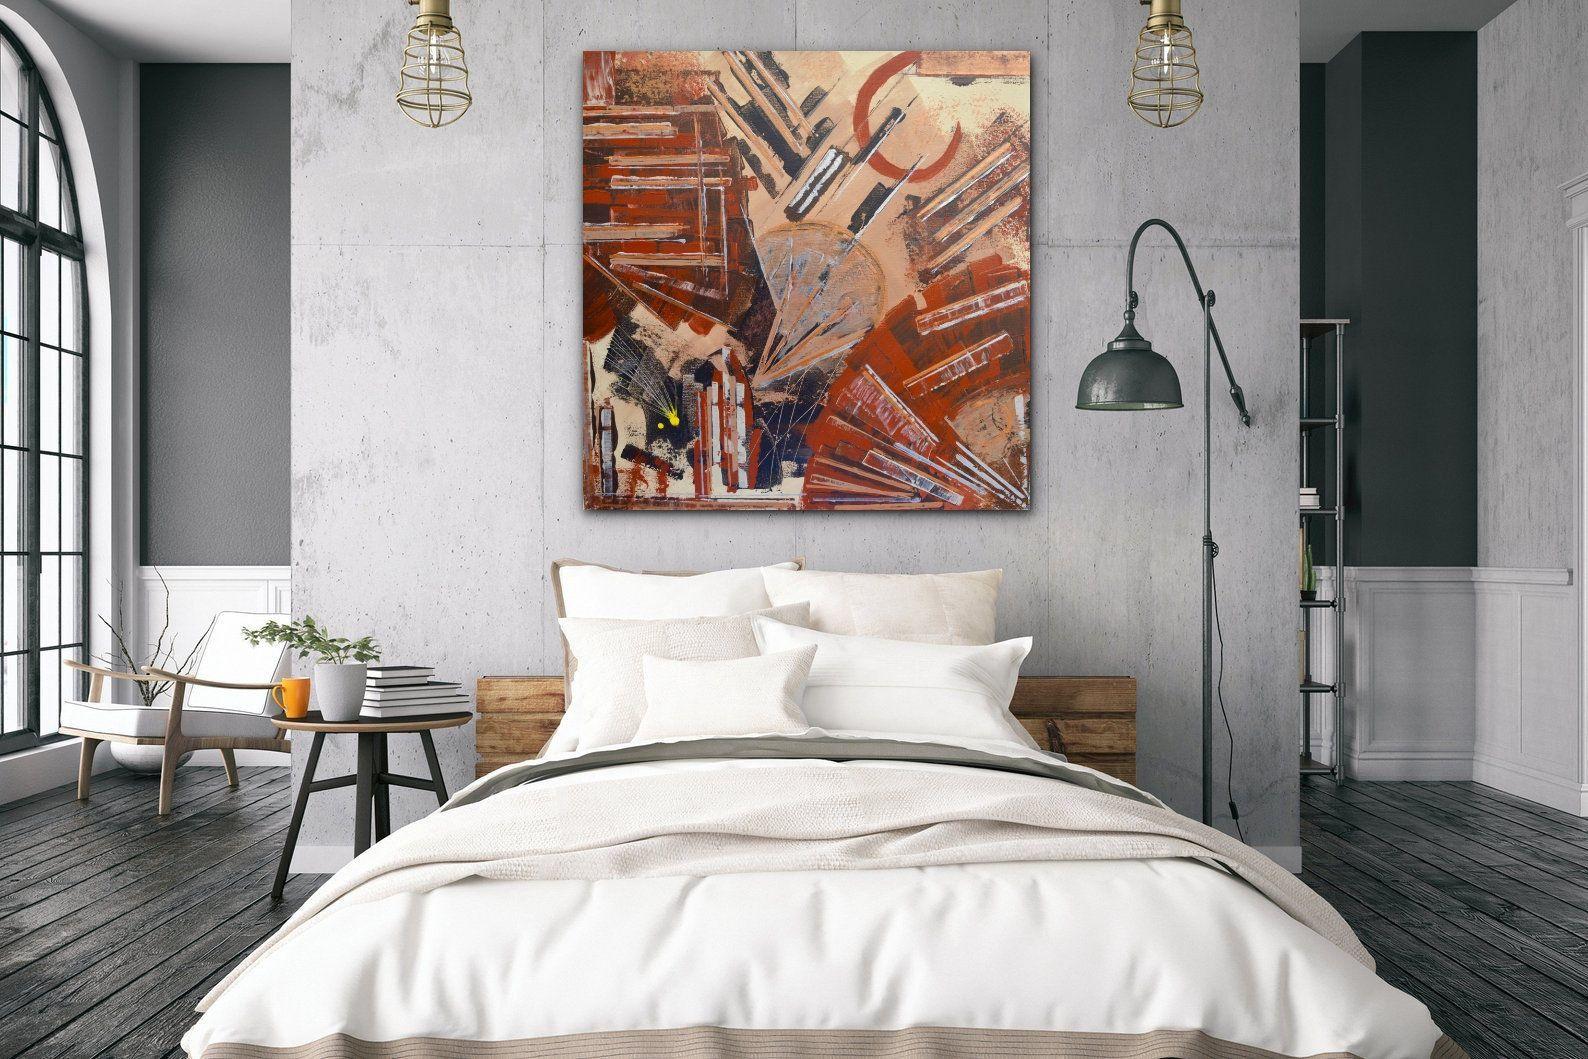 gift,abstract art,home decor,office decor,wall art,wall decor,living room decor,original,original art,canvas art,abstract,painting,eclectic#artabstractpaintingeclectic #artcanvas #arthome #artwall #decorliving #decoroffice #decororiginaloriginal #decorwall #giftabstract #room